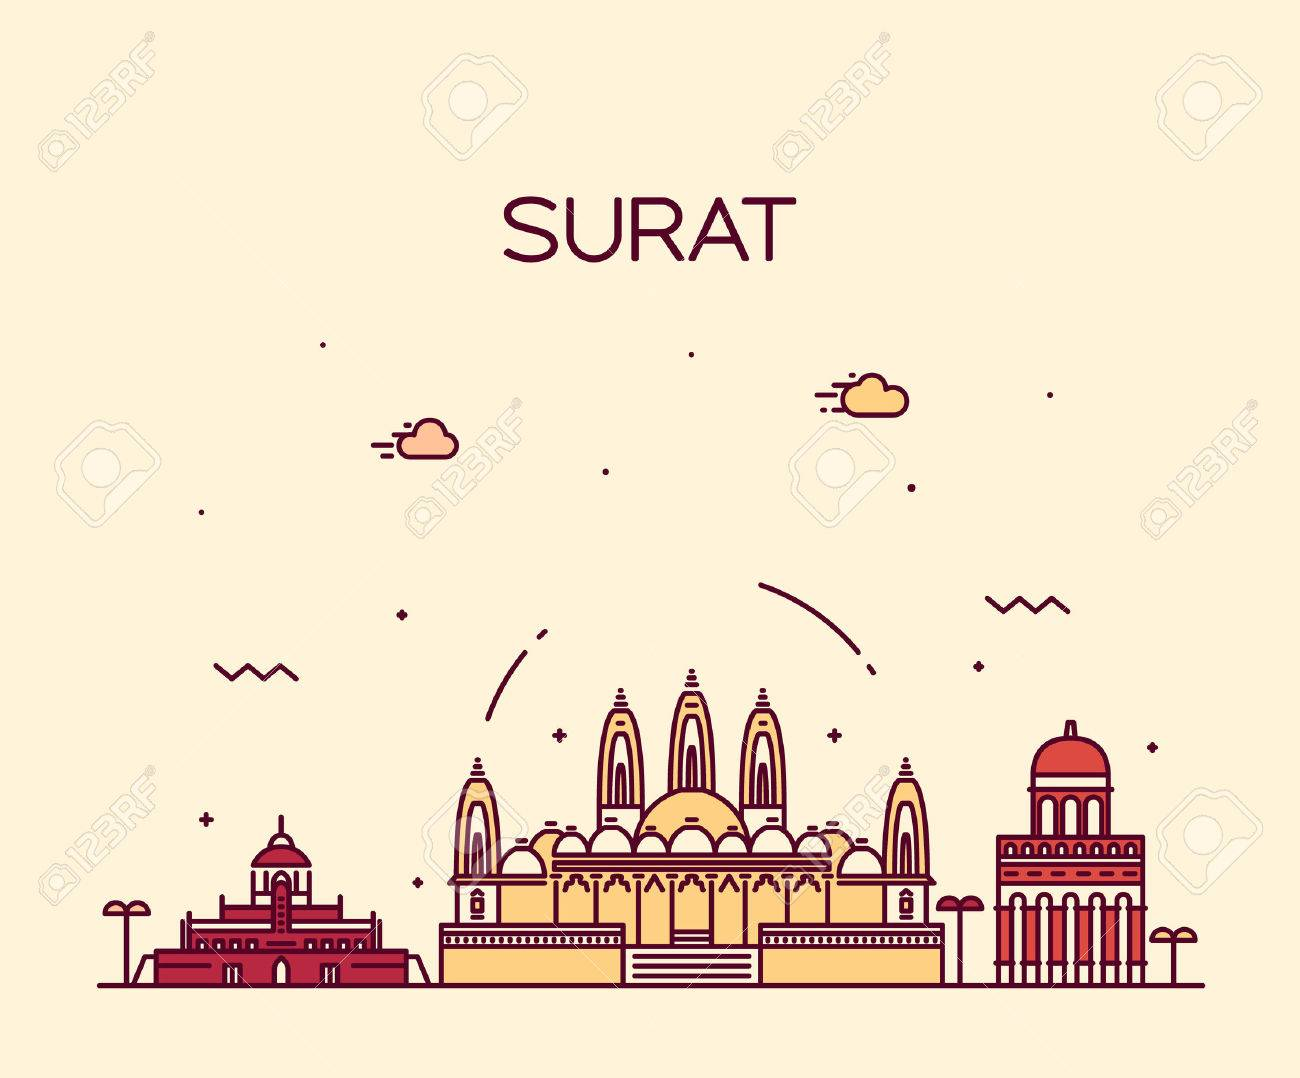 Surat Skyline Detailed Silhouette Trendy Vector Illustration